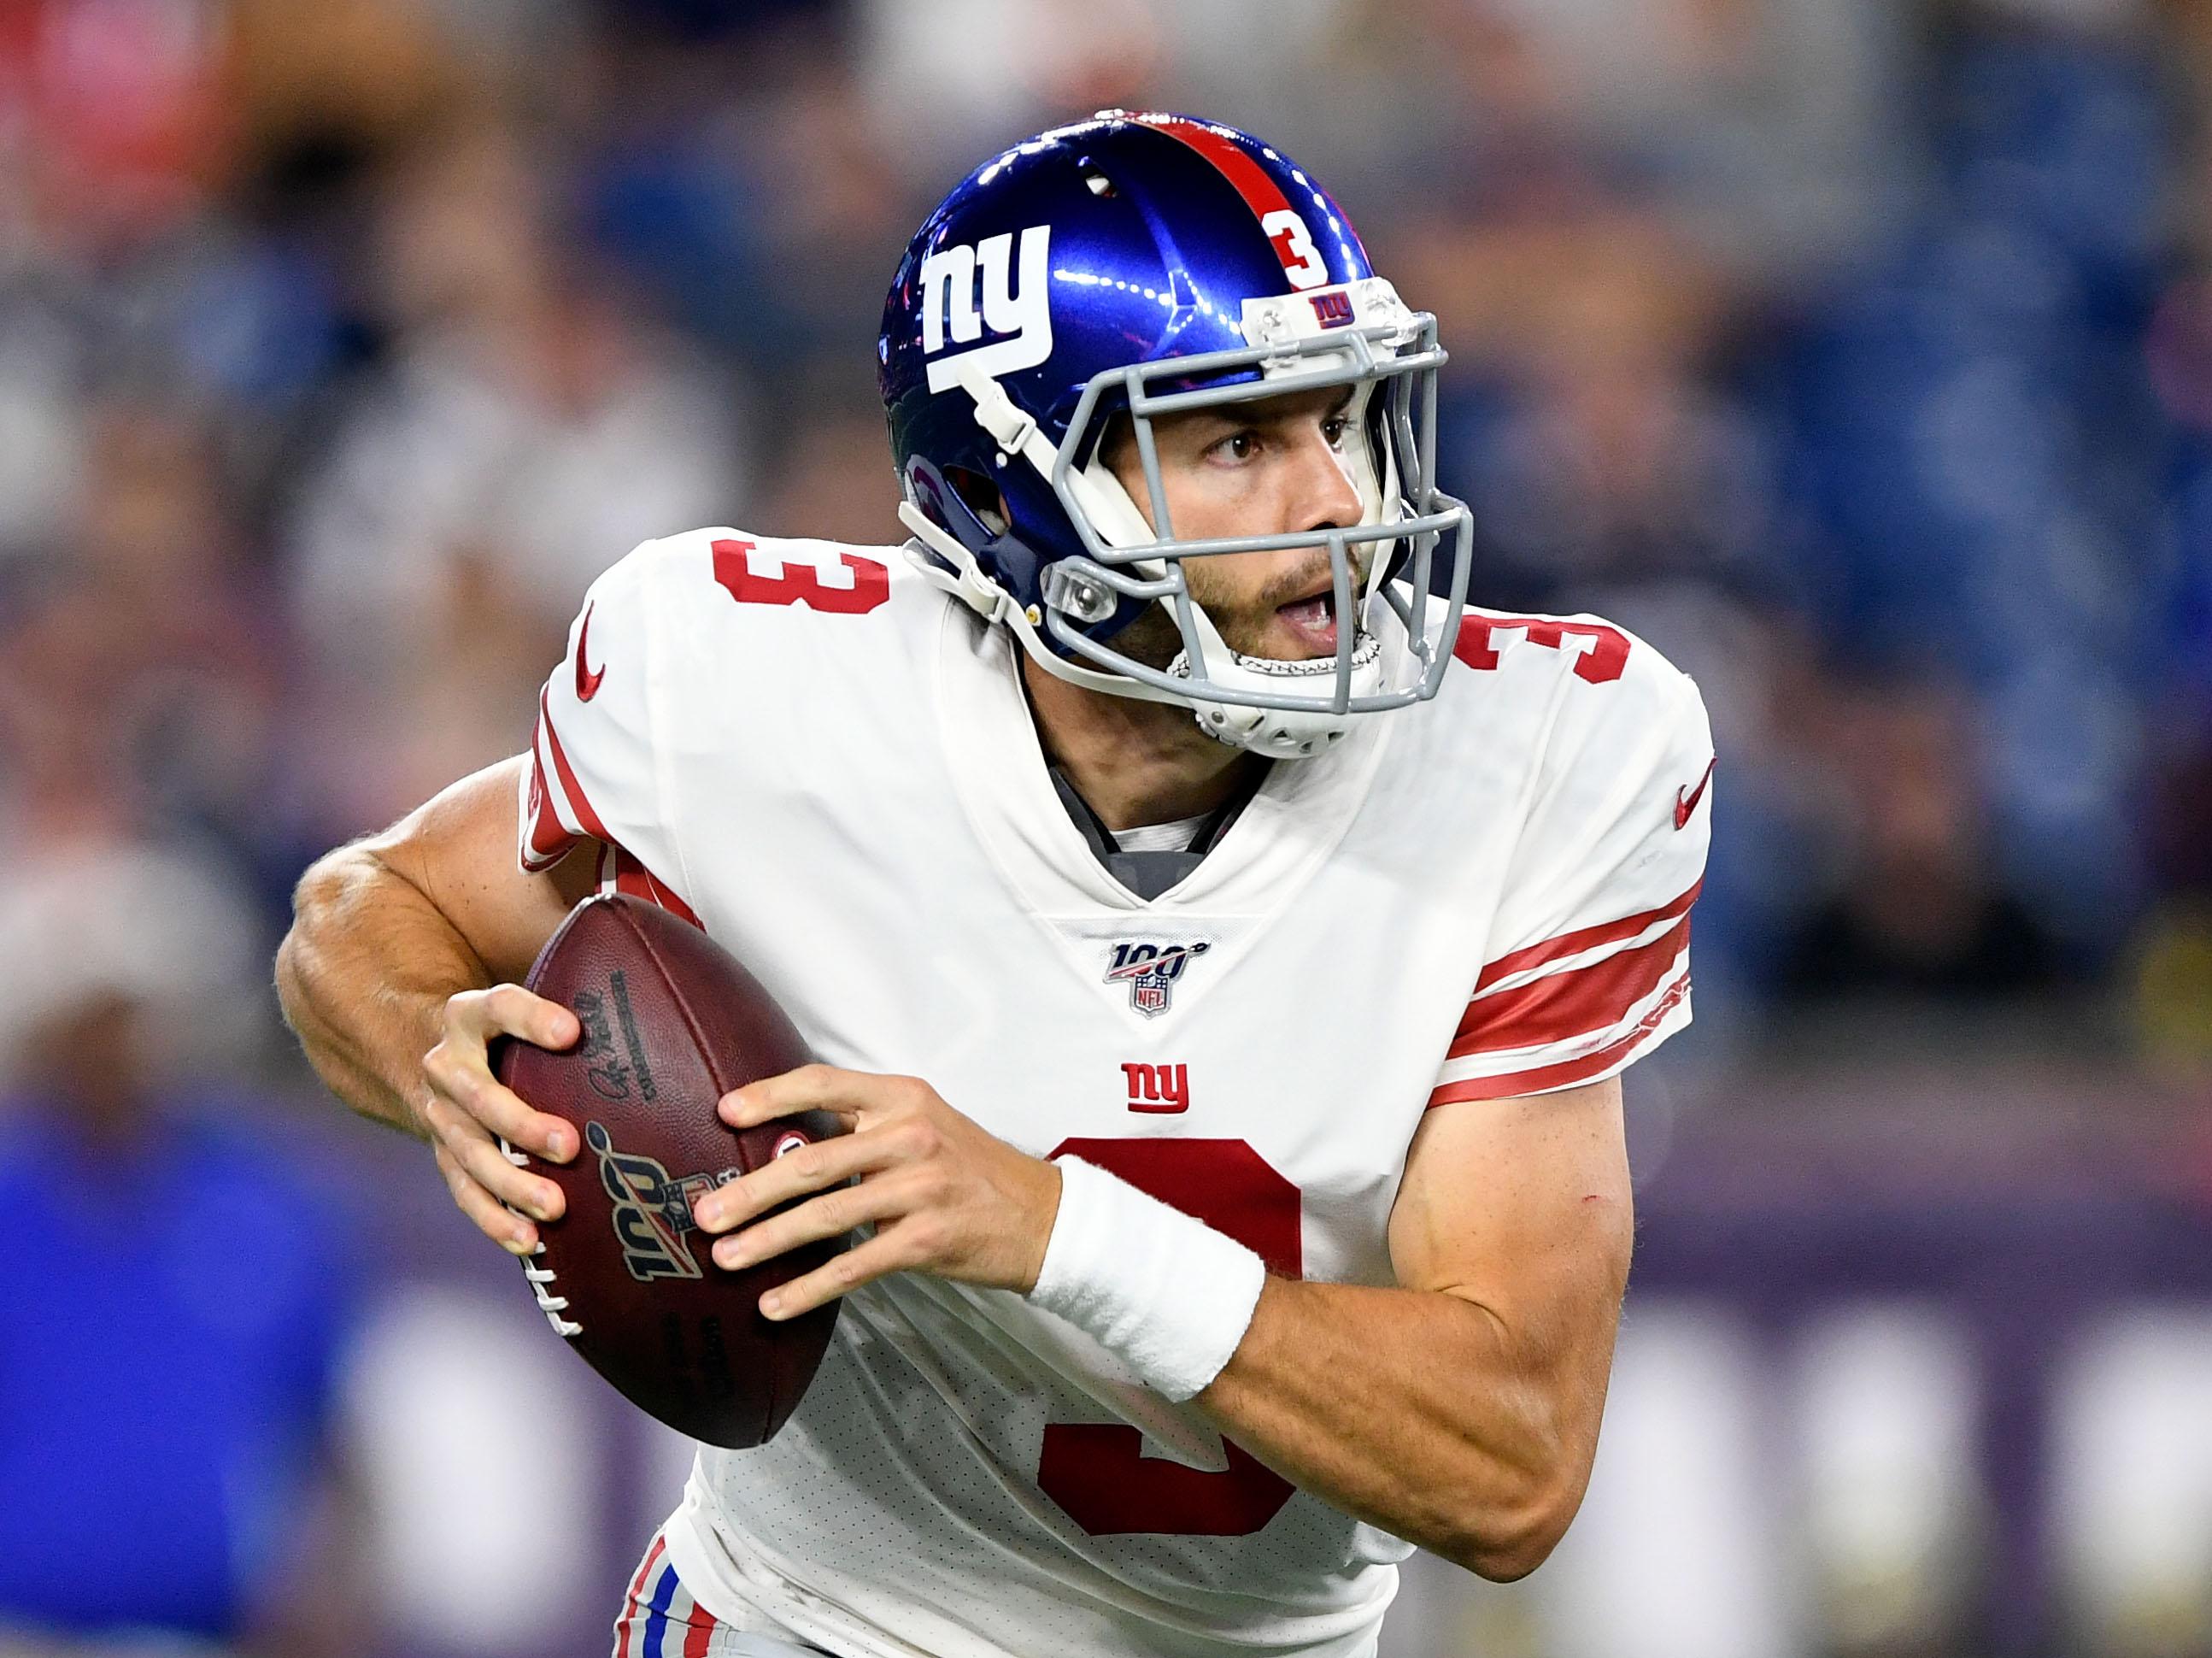 NFL: Preseason-New York Giants at New England Patriots